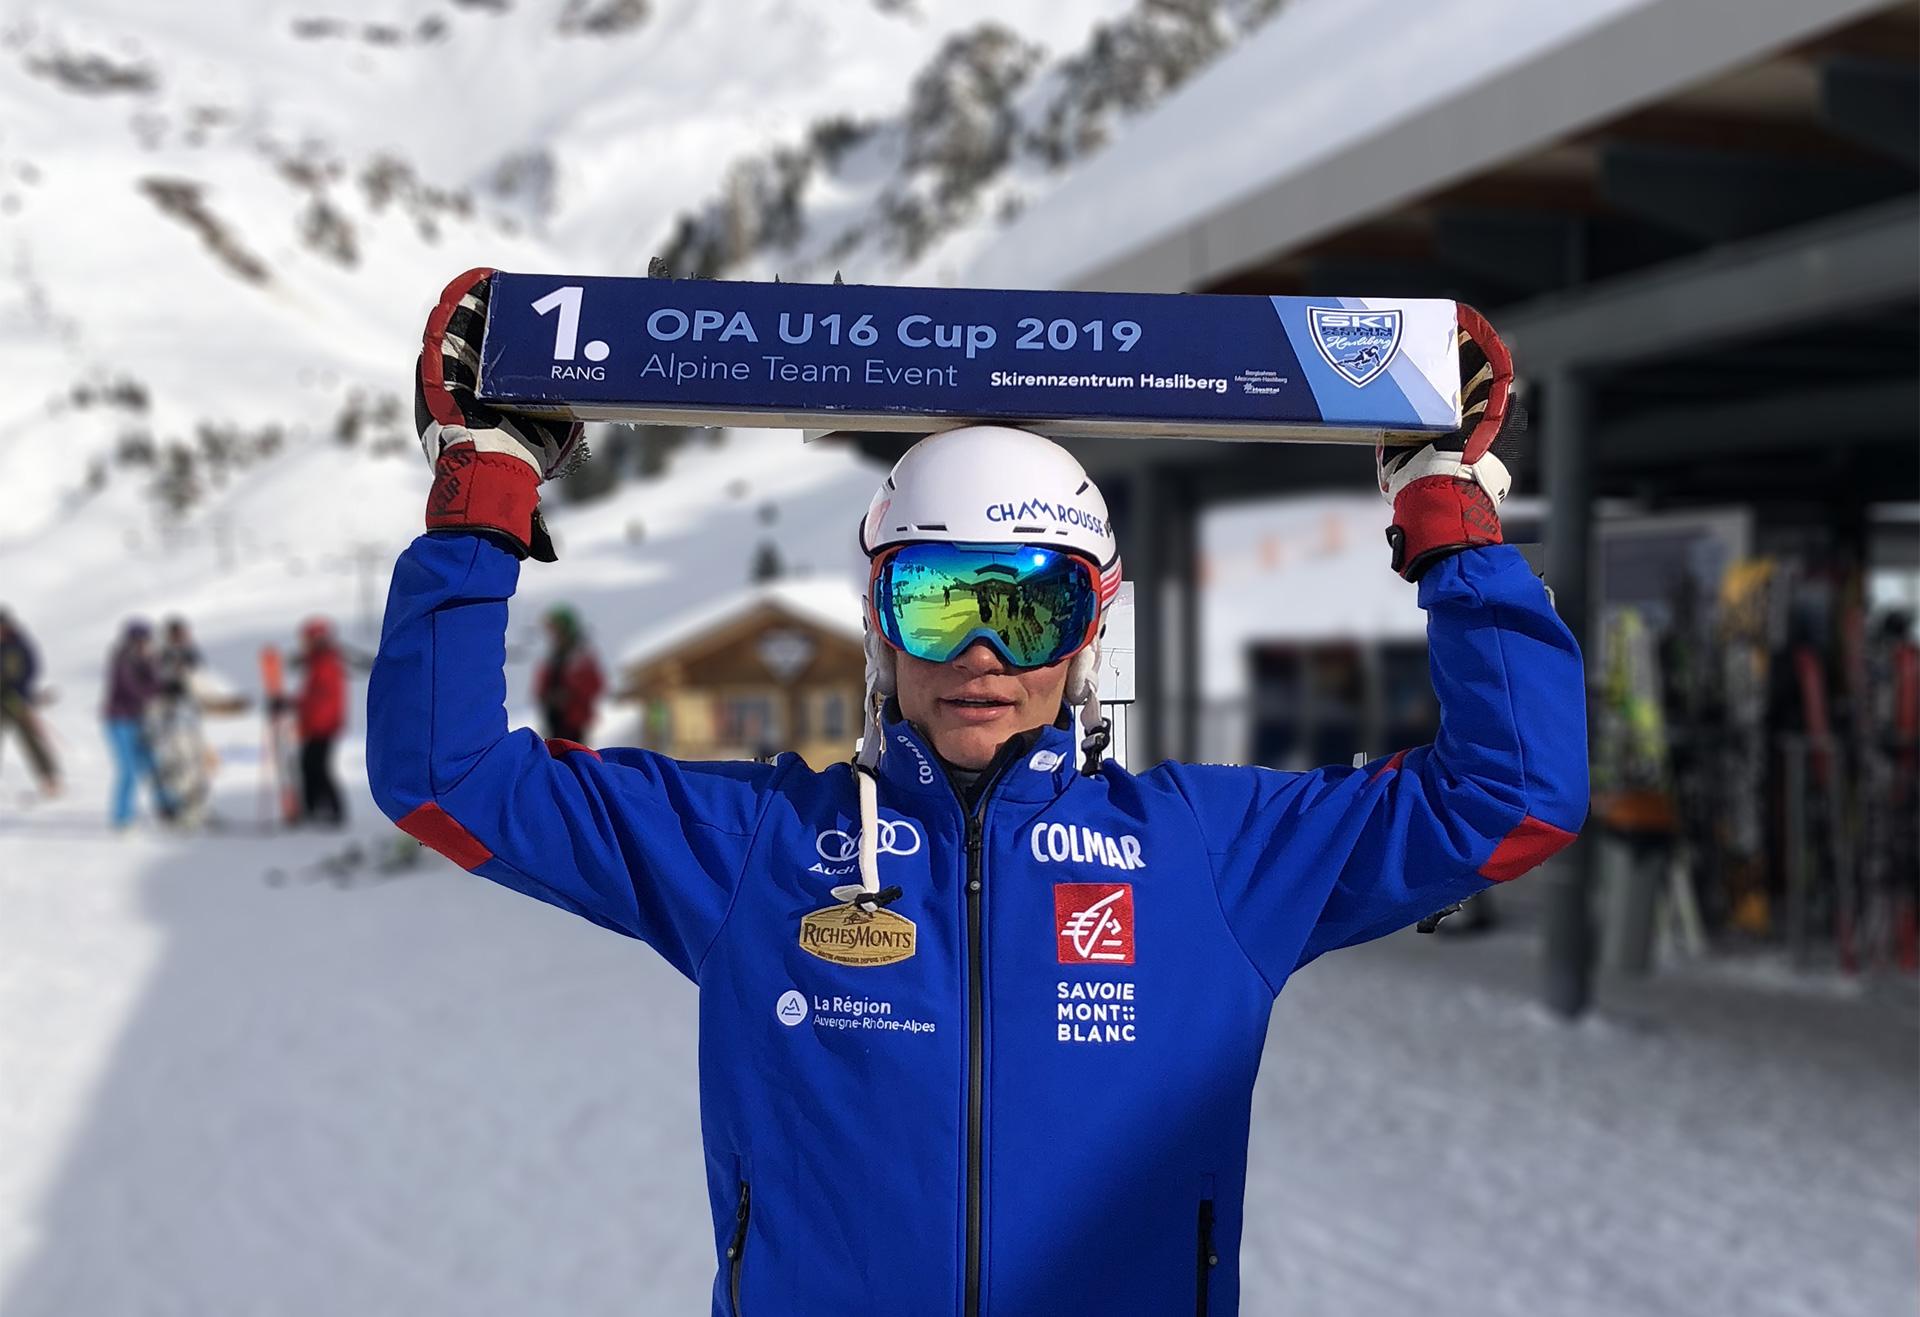 Chamrousse champion alban elezi cannaferina ski alpin slalom station ski isère france - © Alban Elezi Cannaferina